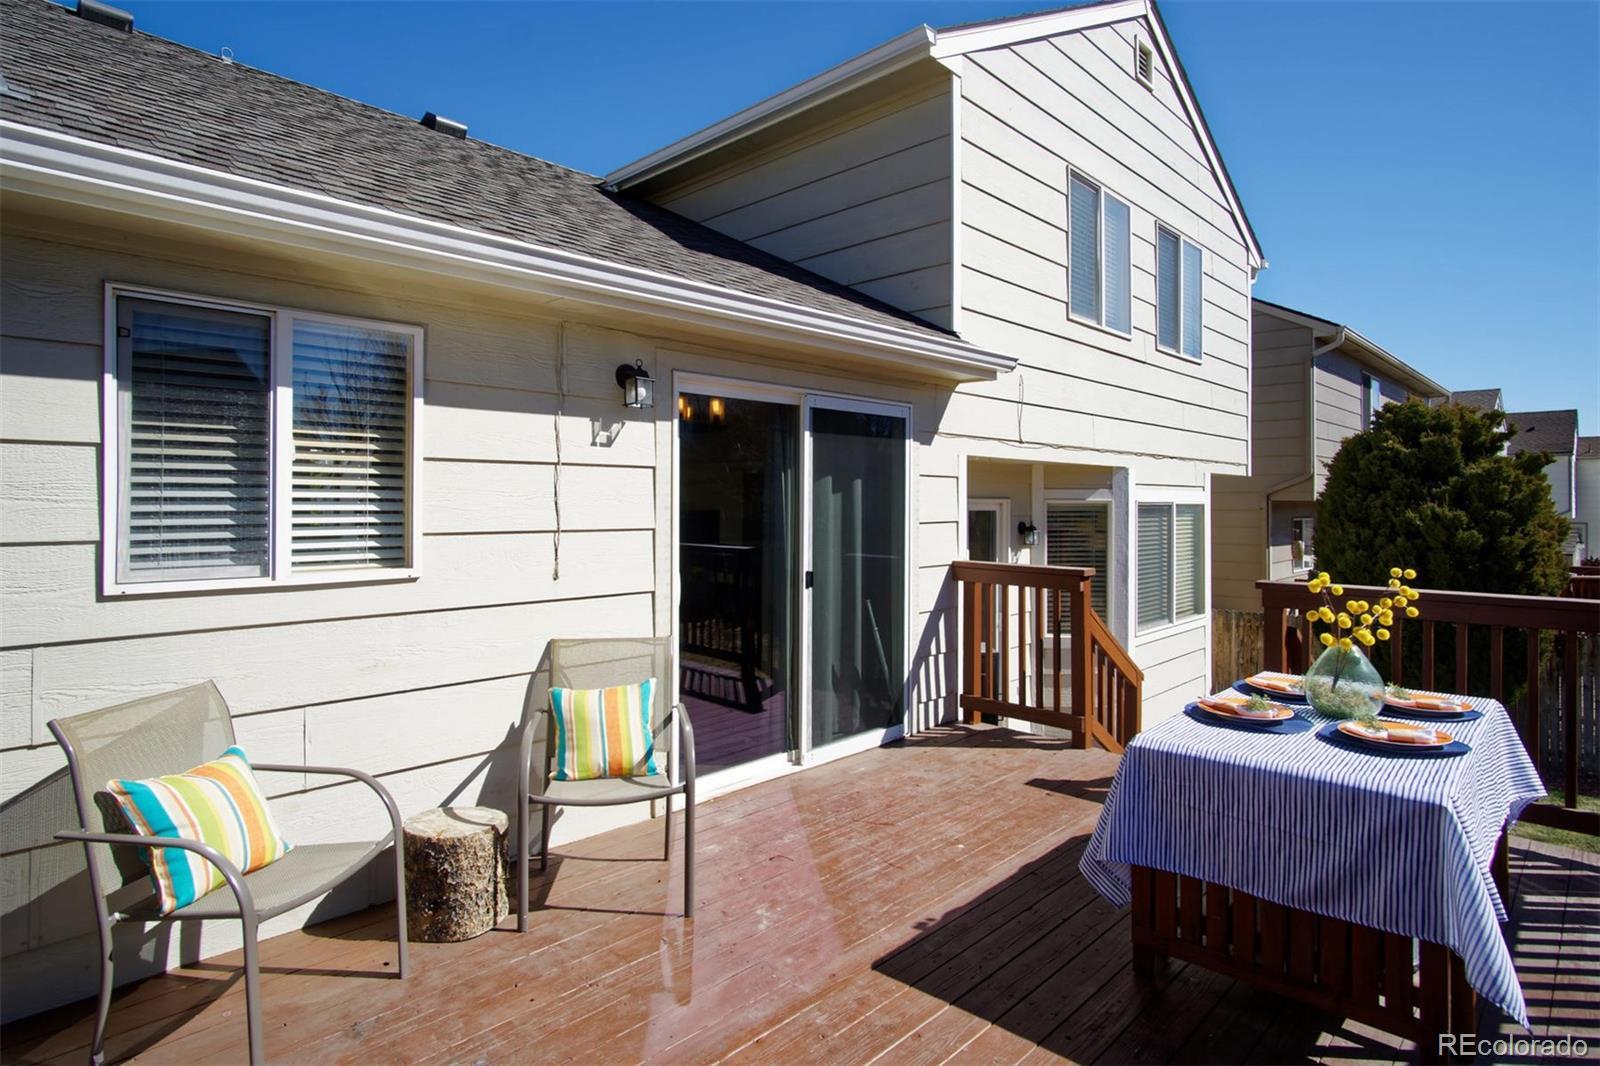 MLS# 1588259 - 13 - 11326 W Crestline Drive, Littleton, CO 80127